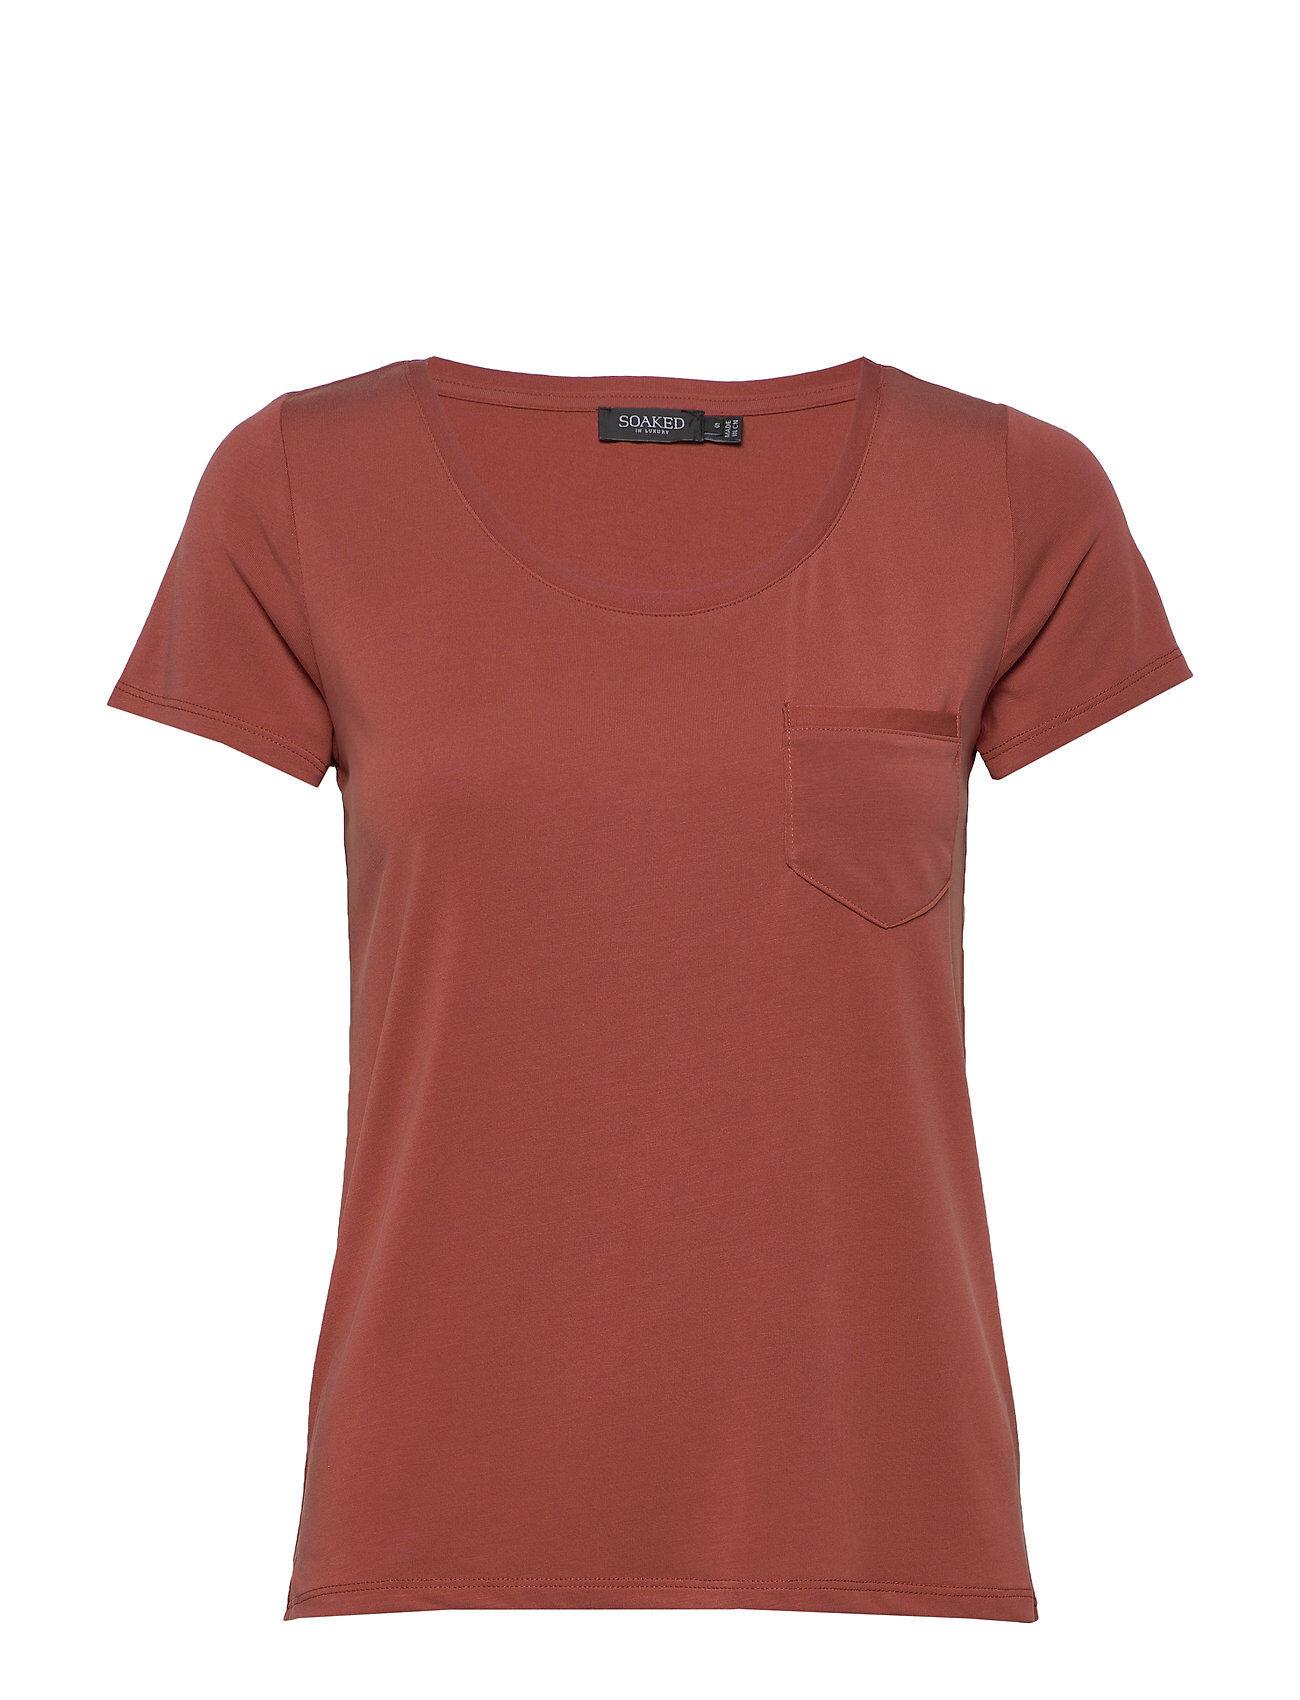 Soaked in Luxury Slcolumbine Tee T-shirts & Tops Short-sleeved Punainen Soaked In Luxury